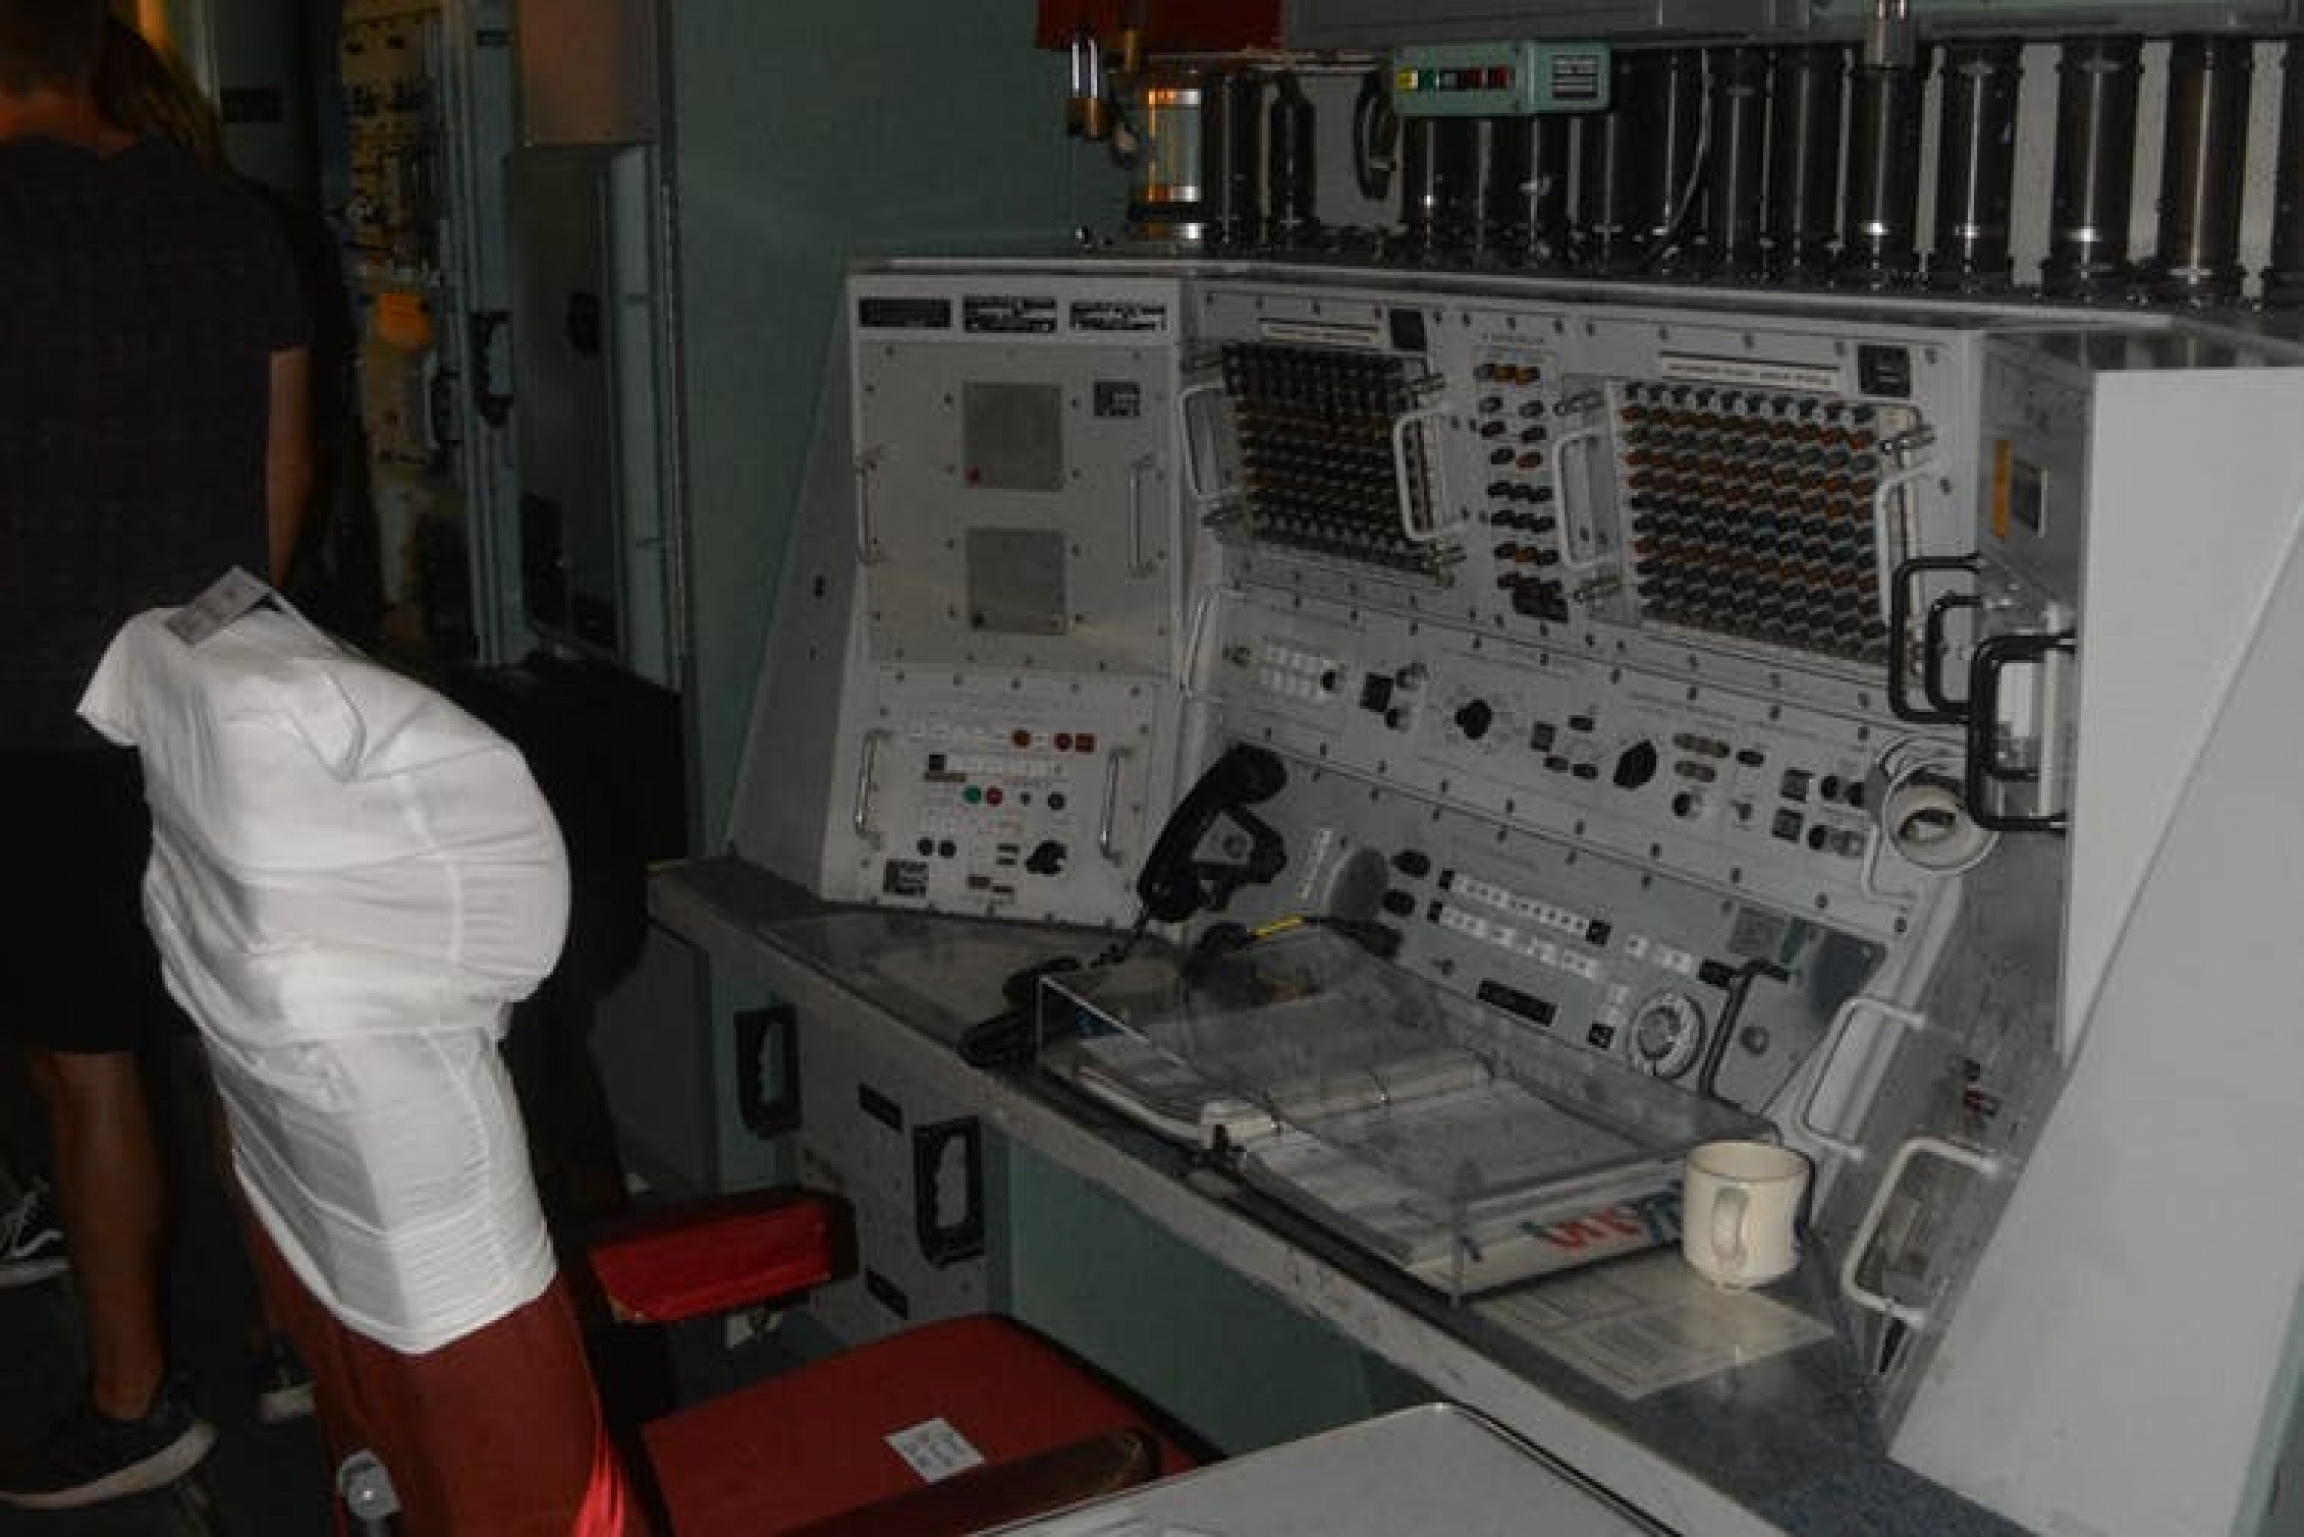 A nuclear operator console.